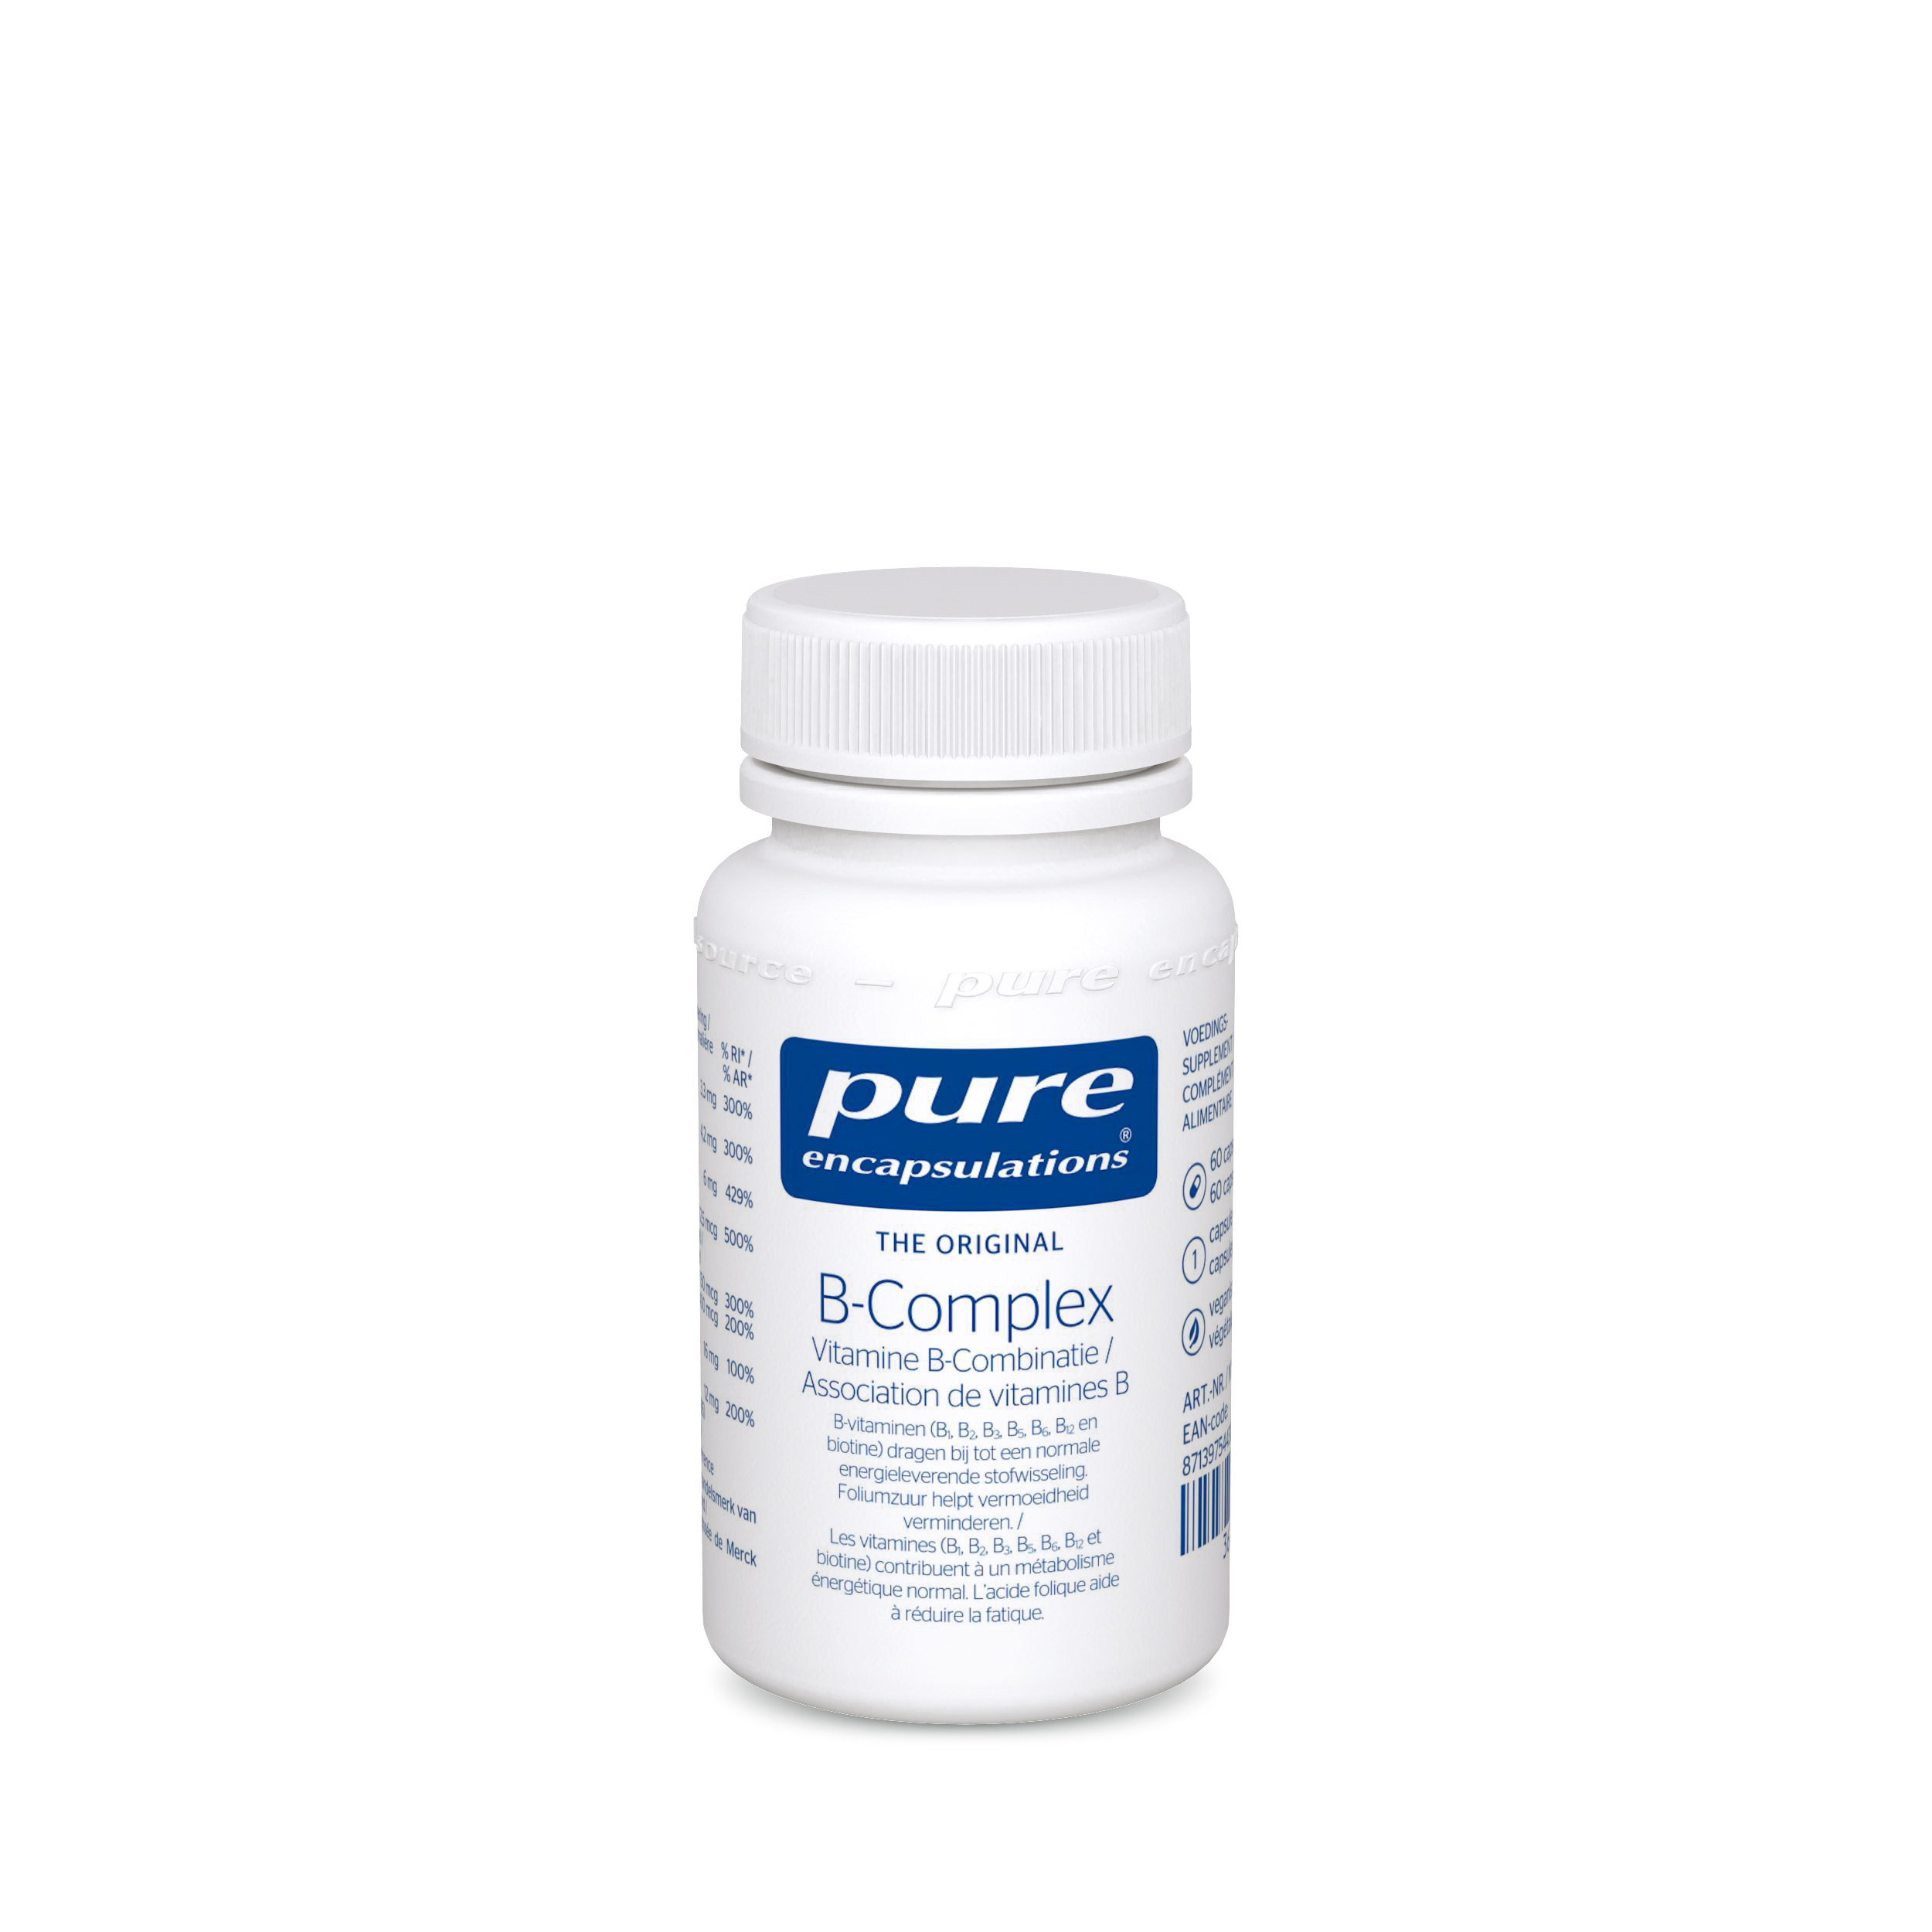 Image of Pure Encapsulations B-Complex